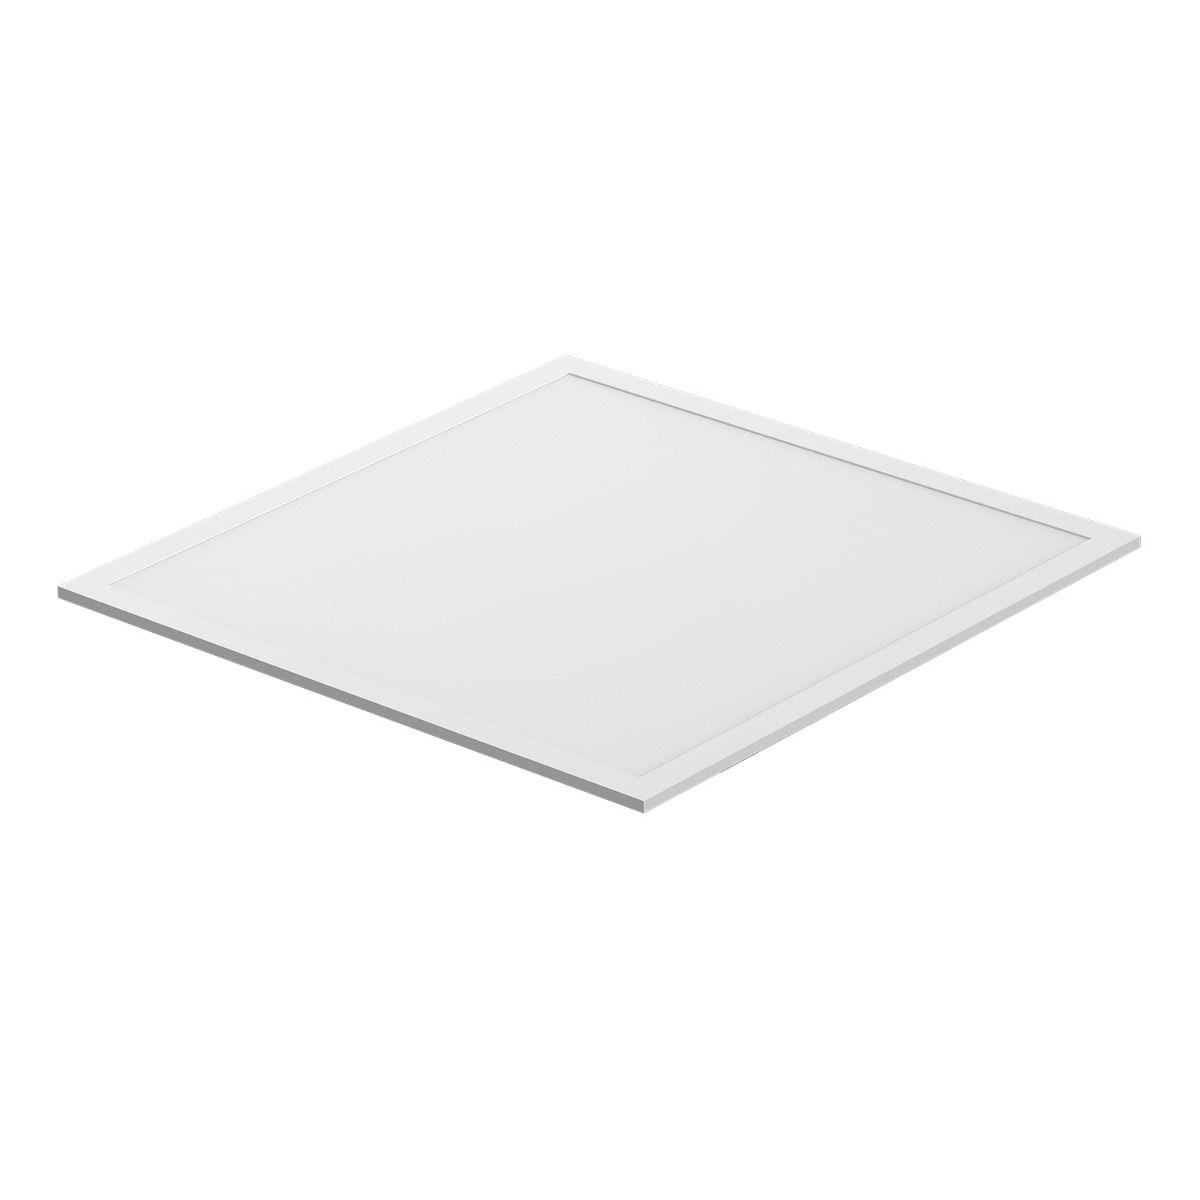 Noxion Panel LED Delta Pro V2.0 Xitanium DALI 30W 60x60cm 3000K 3960lm UGR <19 | Dali Regulable - Luz Cálida - Reemplazo 4x18W